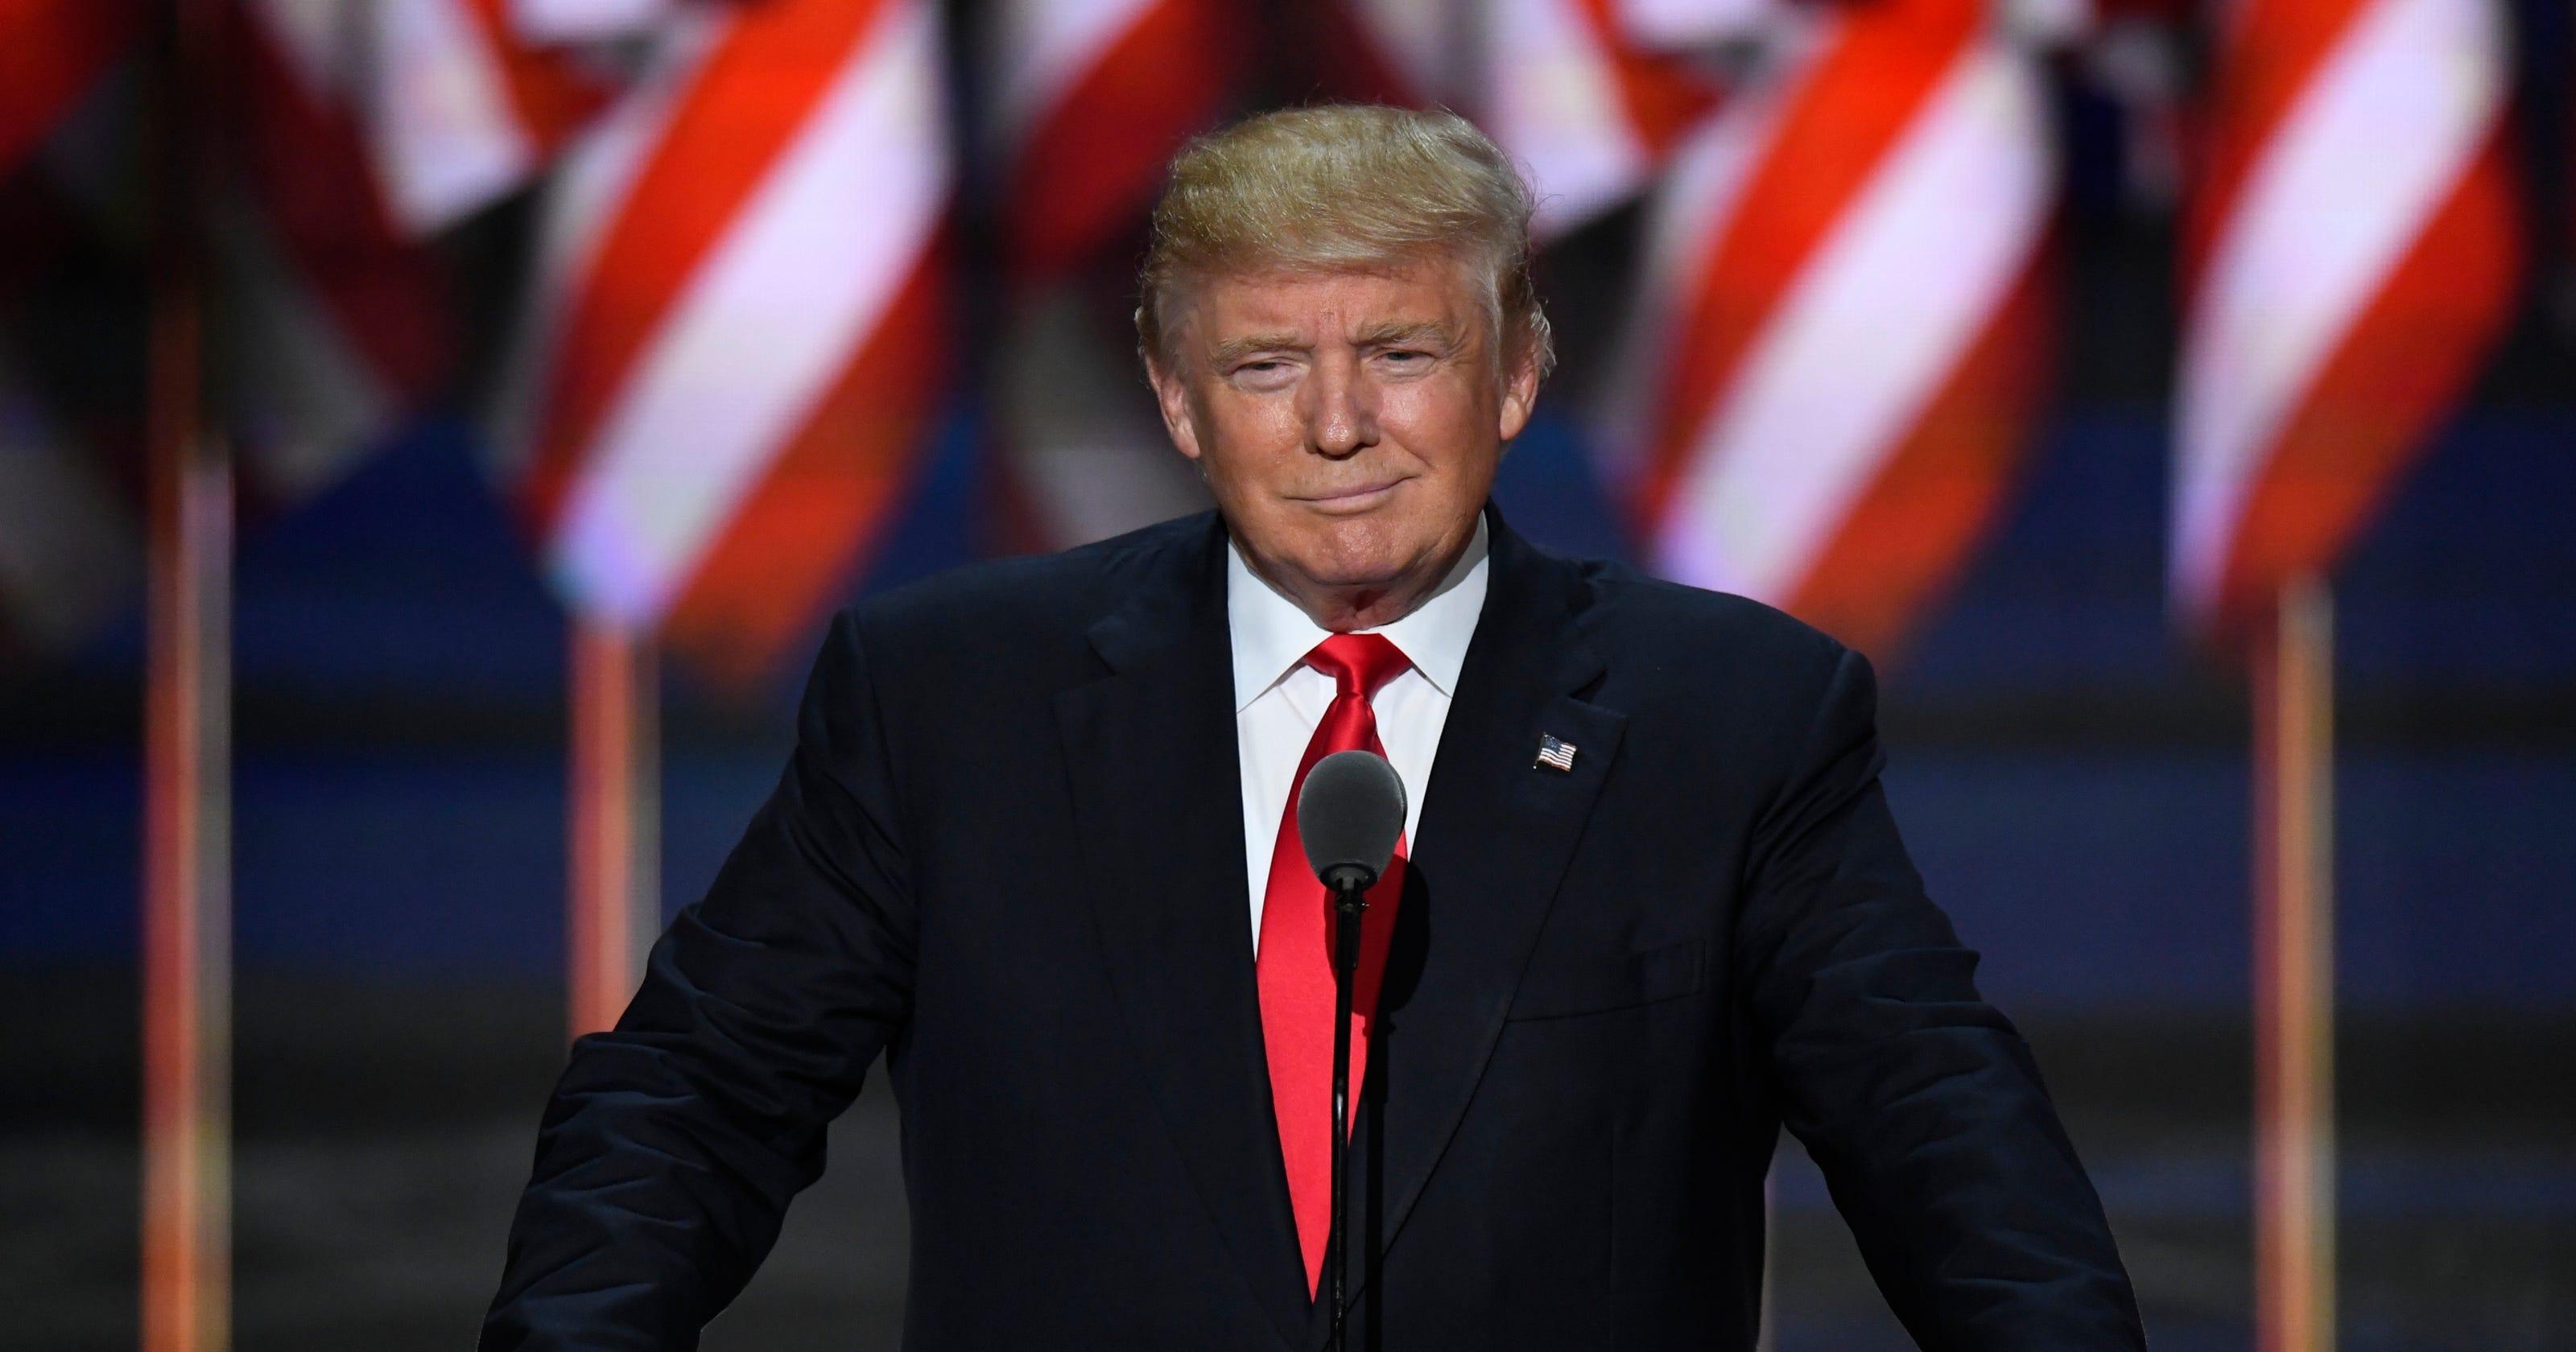 9d62b38a Donald Trump accepts GOP nomination, says 'I alone can fix' system